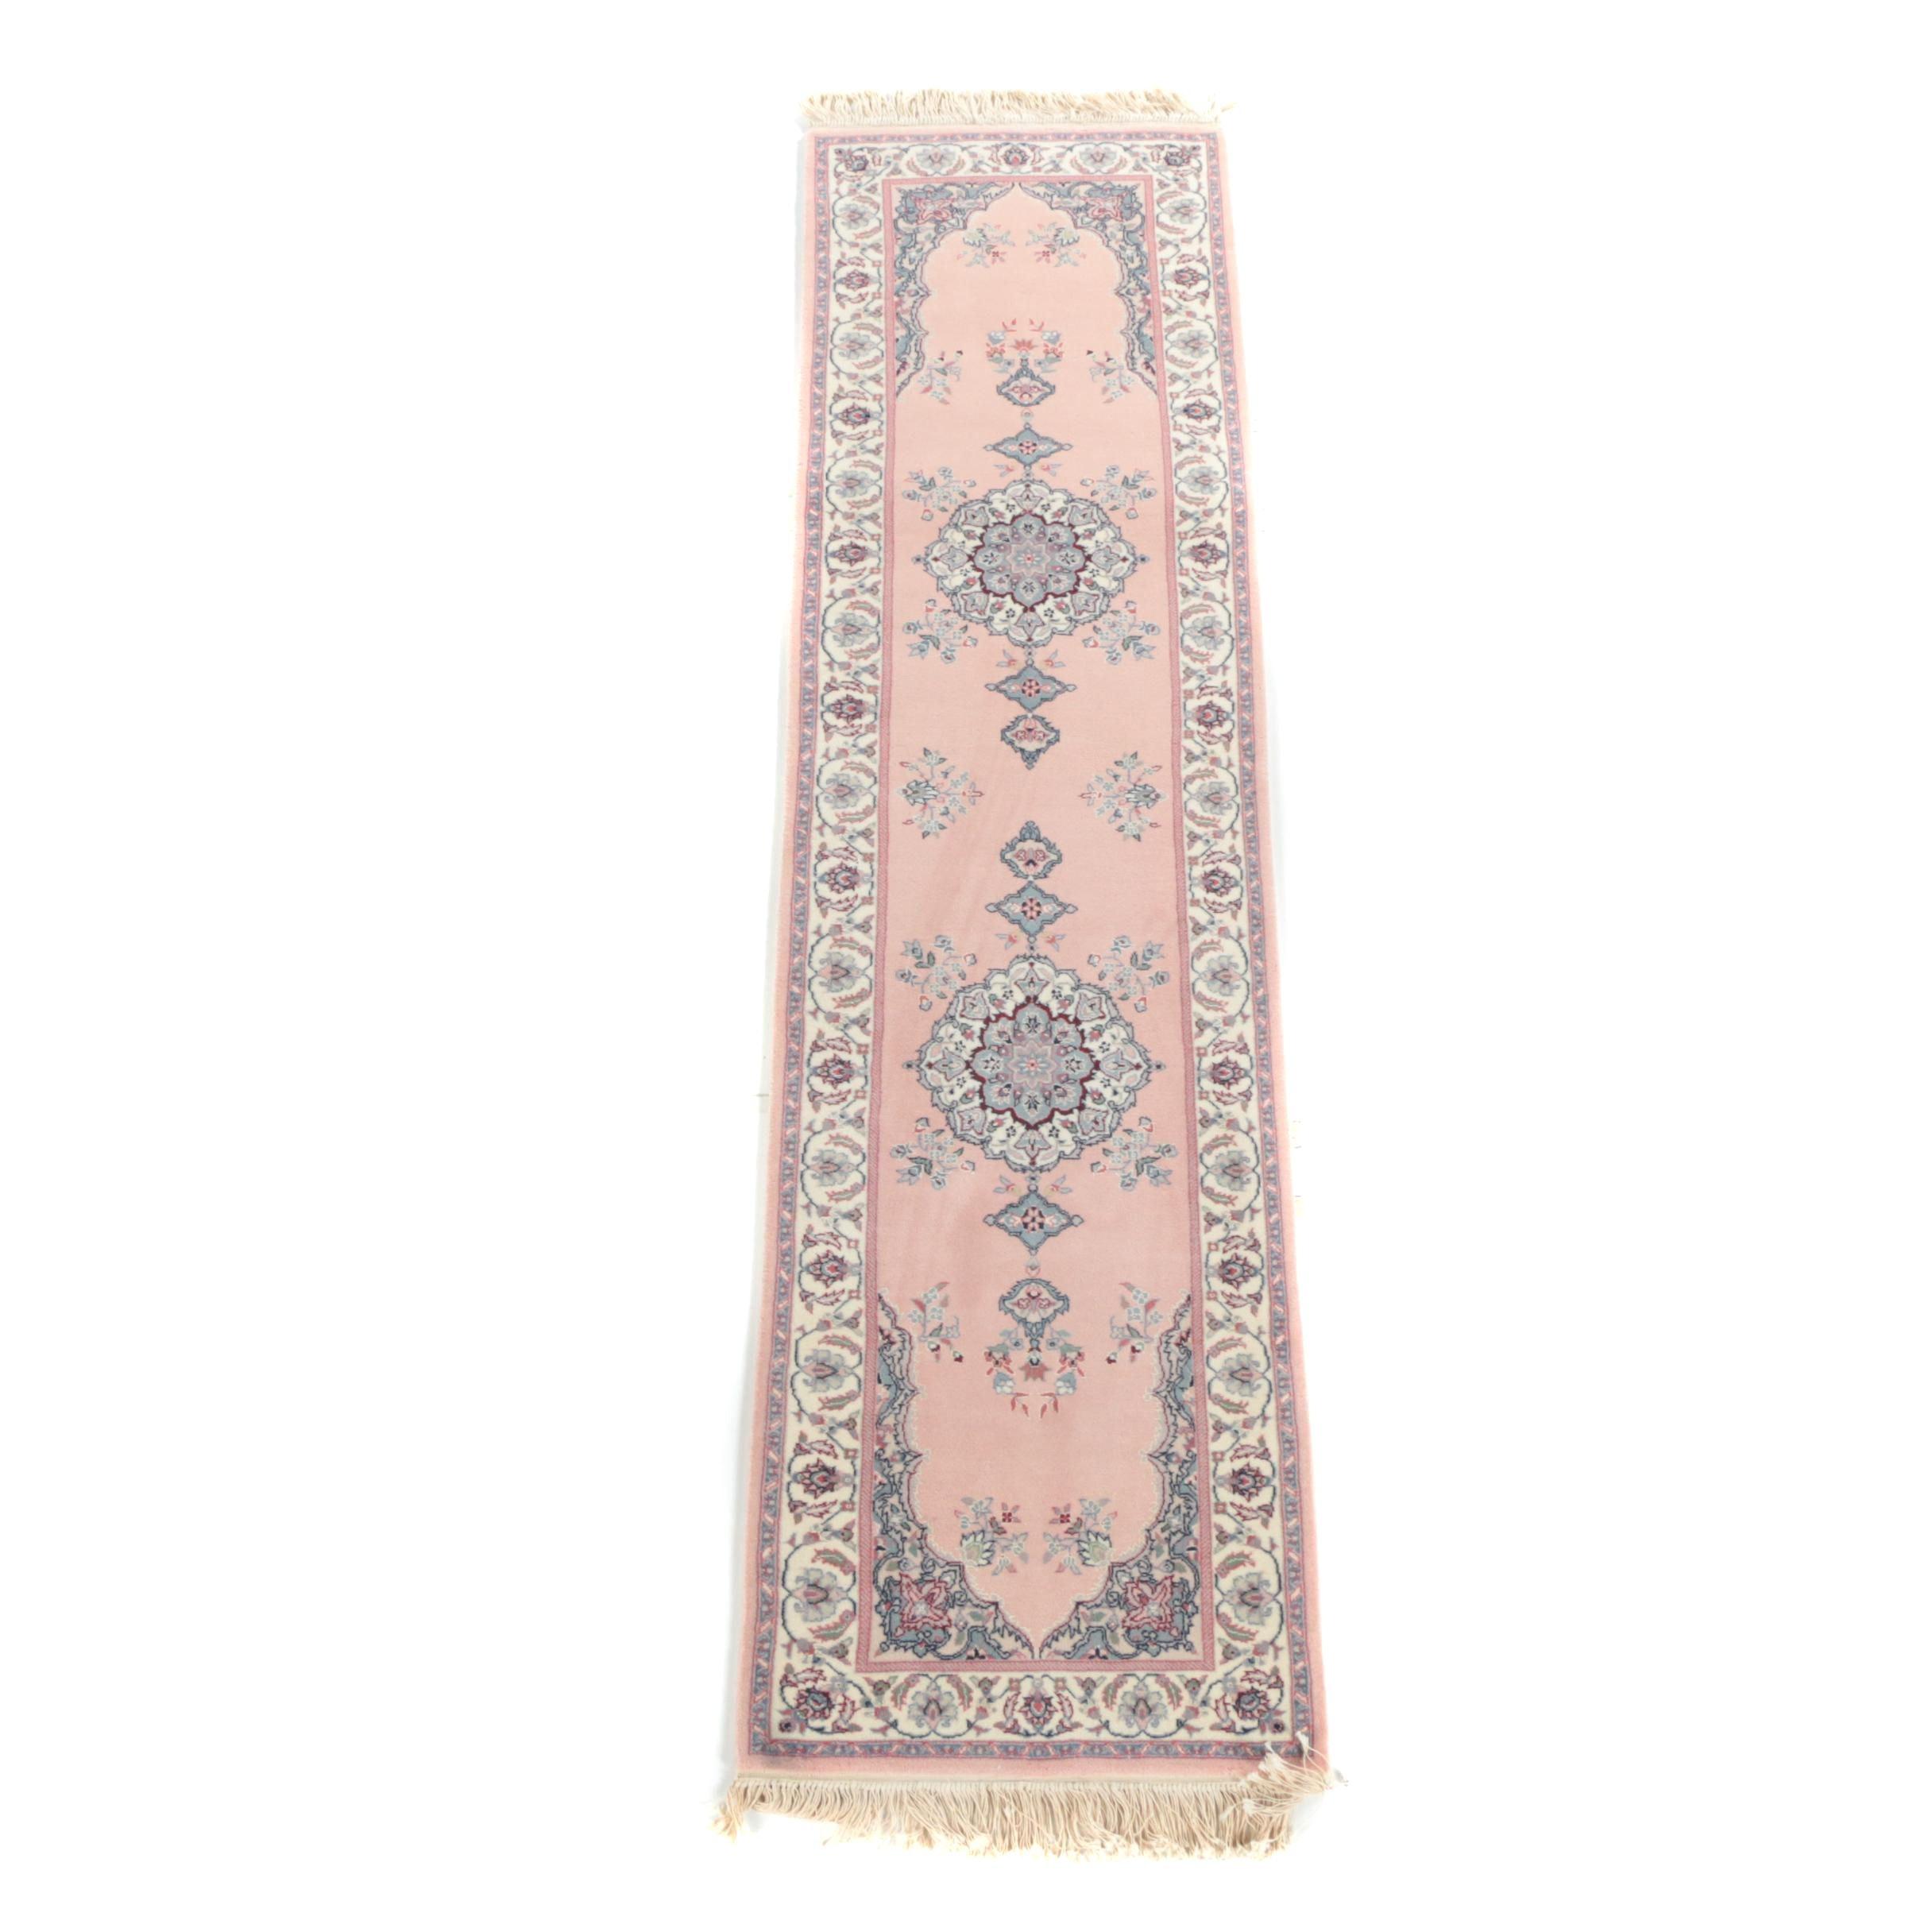 Hand-Knotted Sino-Persian Wool Carpet Runner